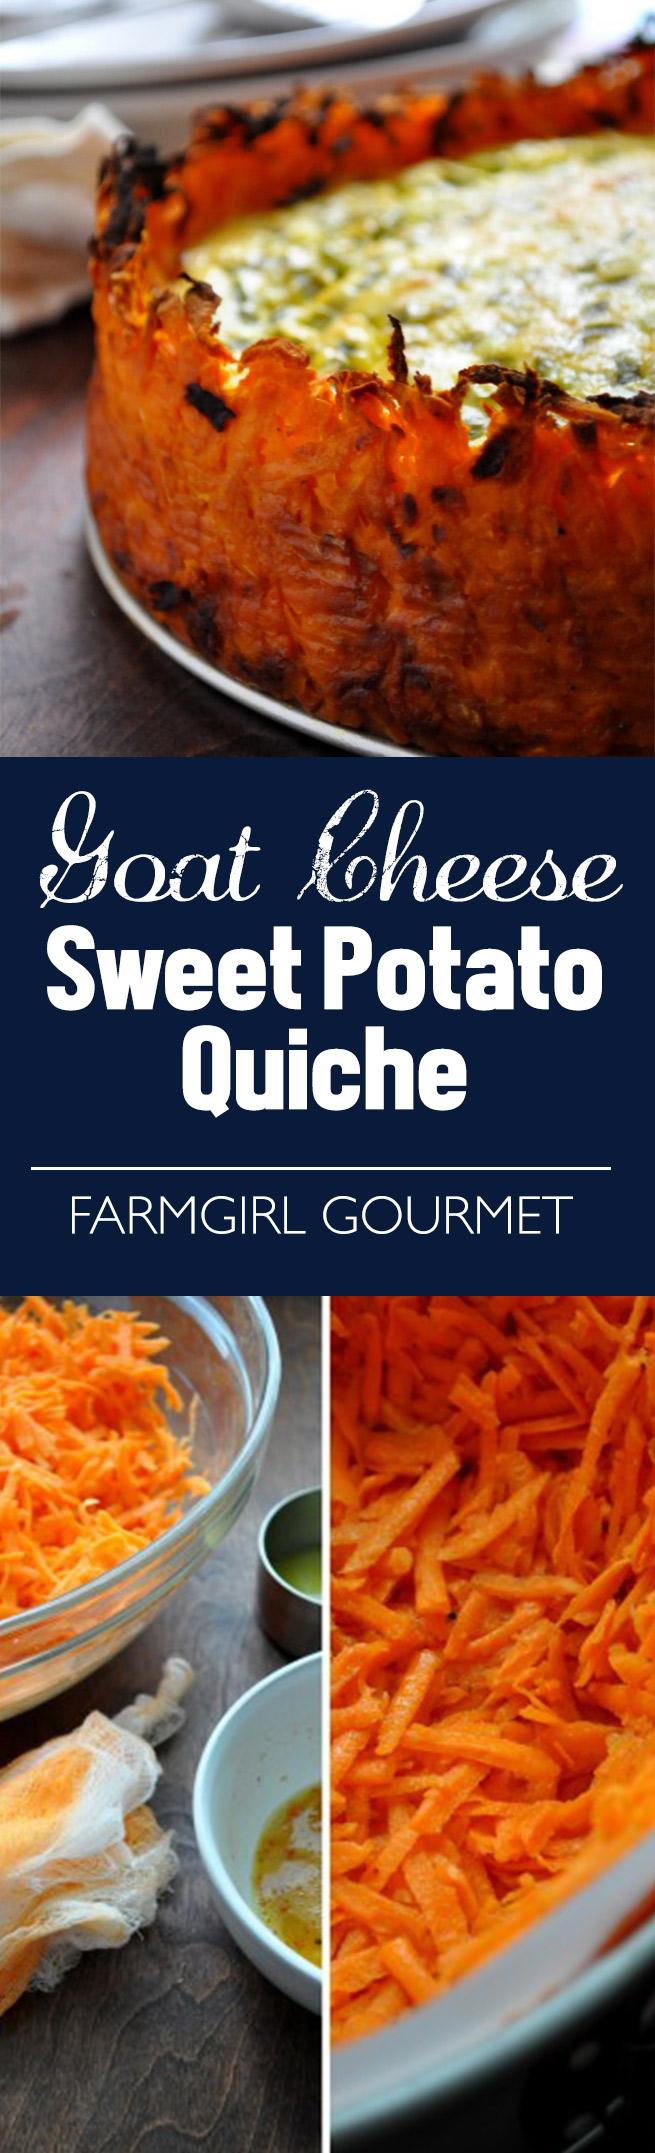 Goat Cheese Quiche with Sweet Potato Crust   farmgirlgourmet.com